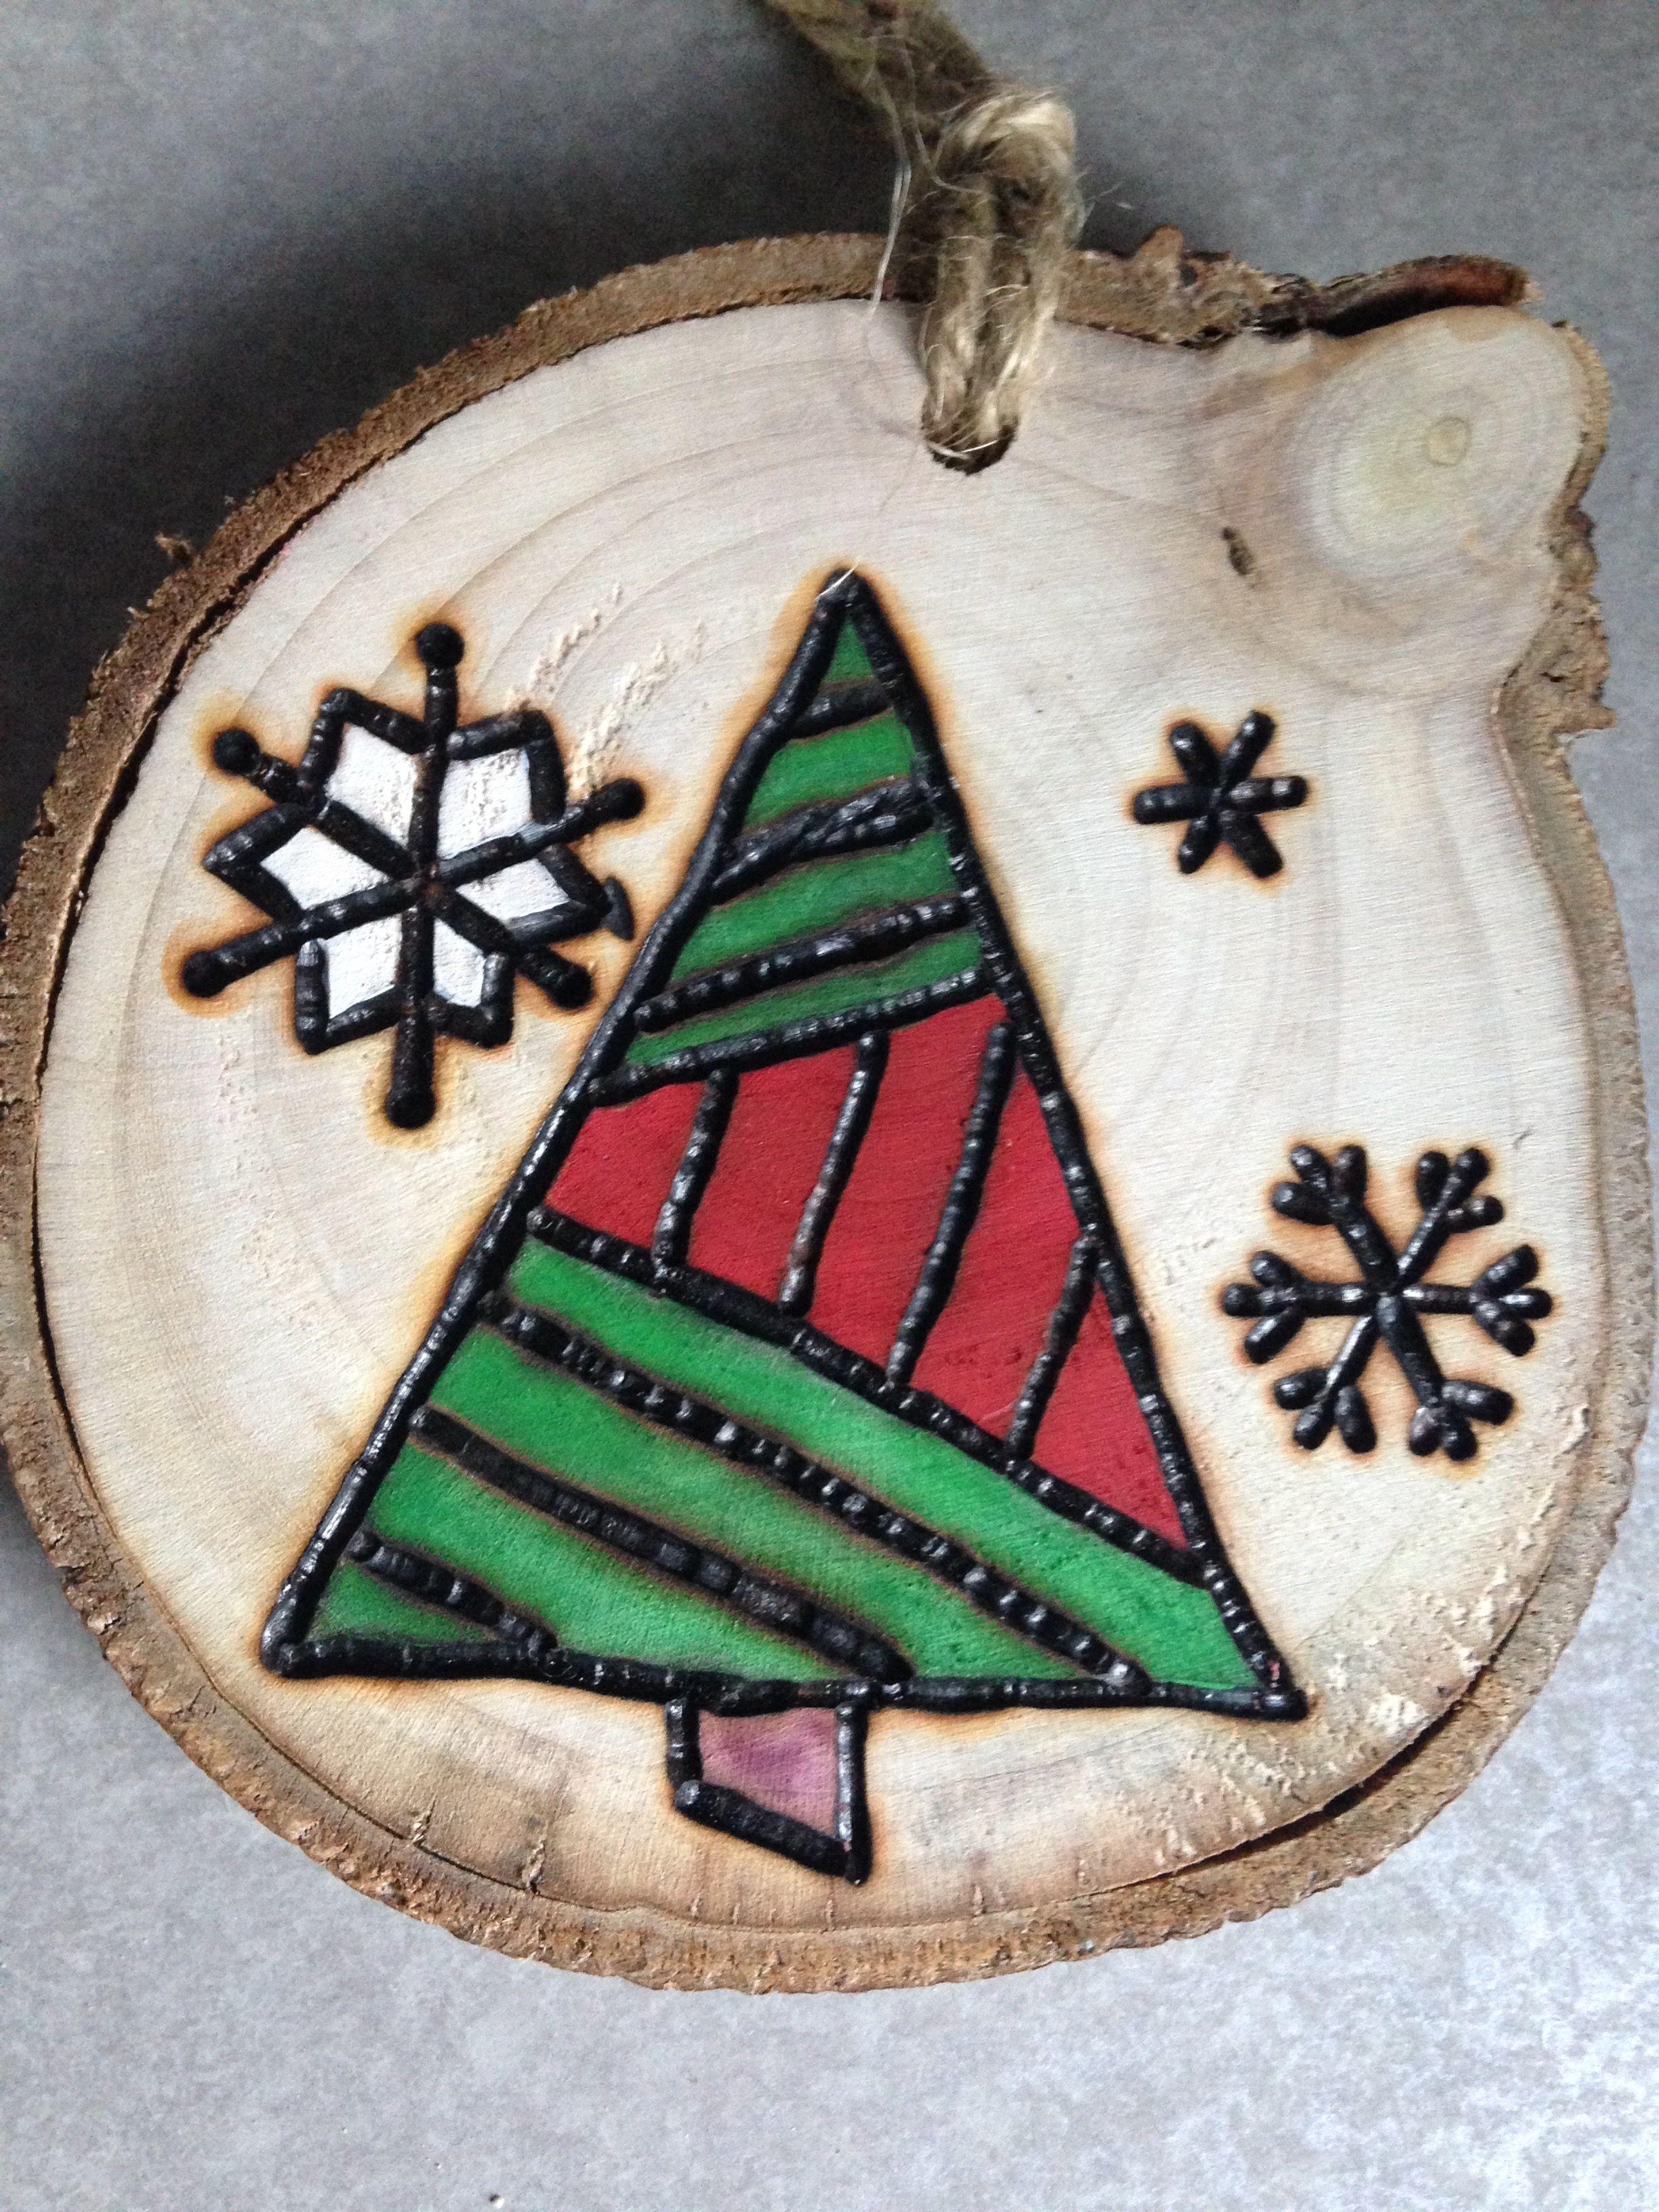 Rustic Tree Hand Painted Wood Burned Christmas Ornament